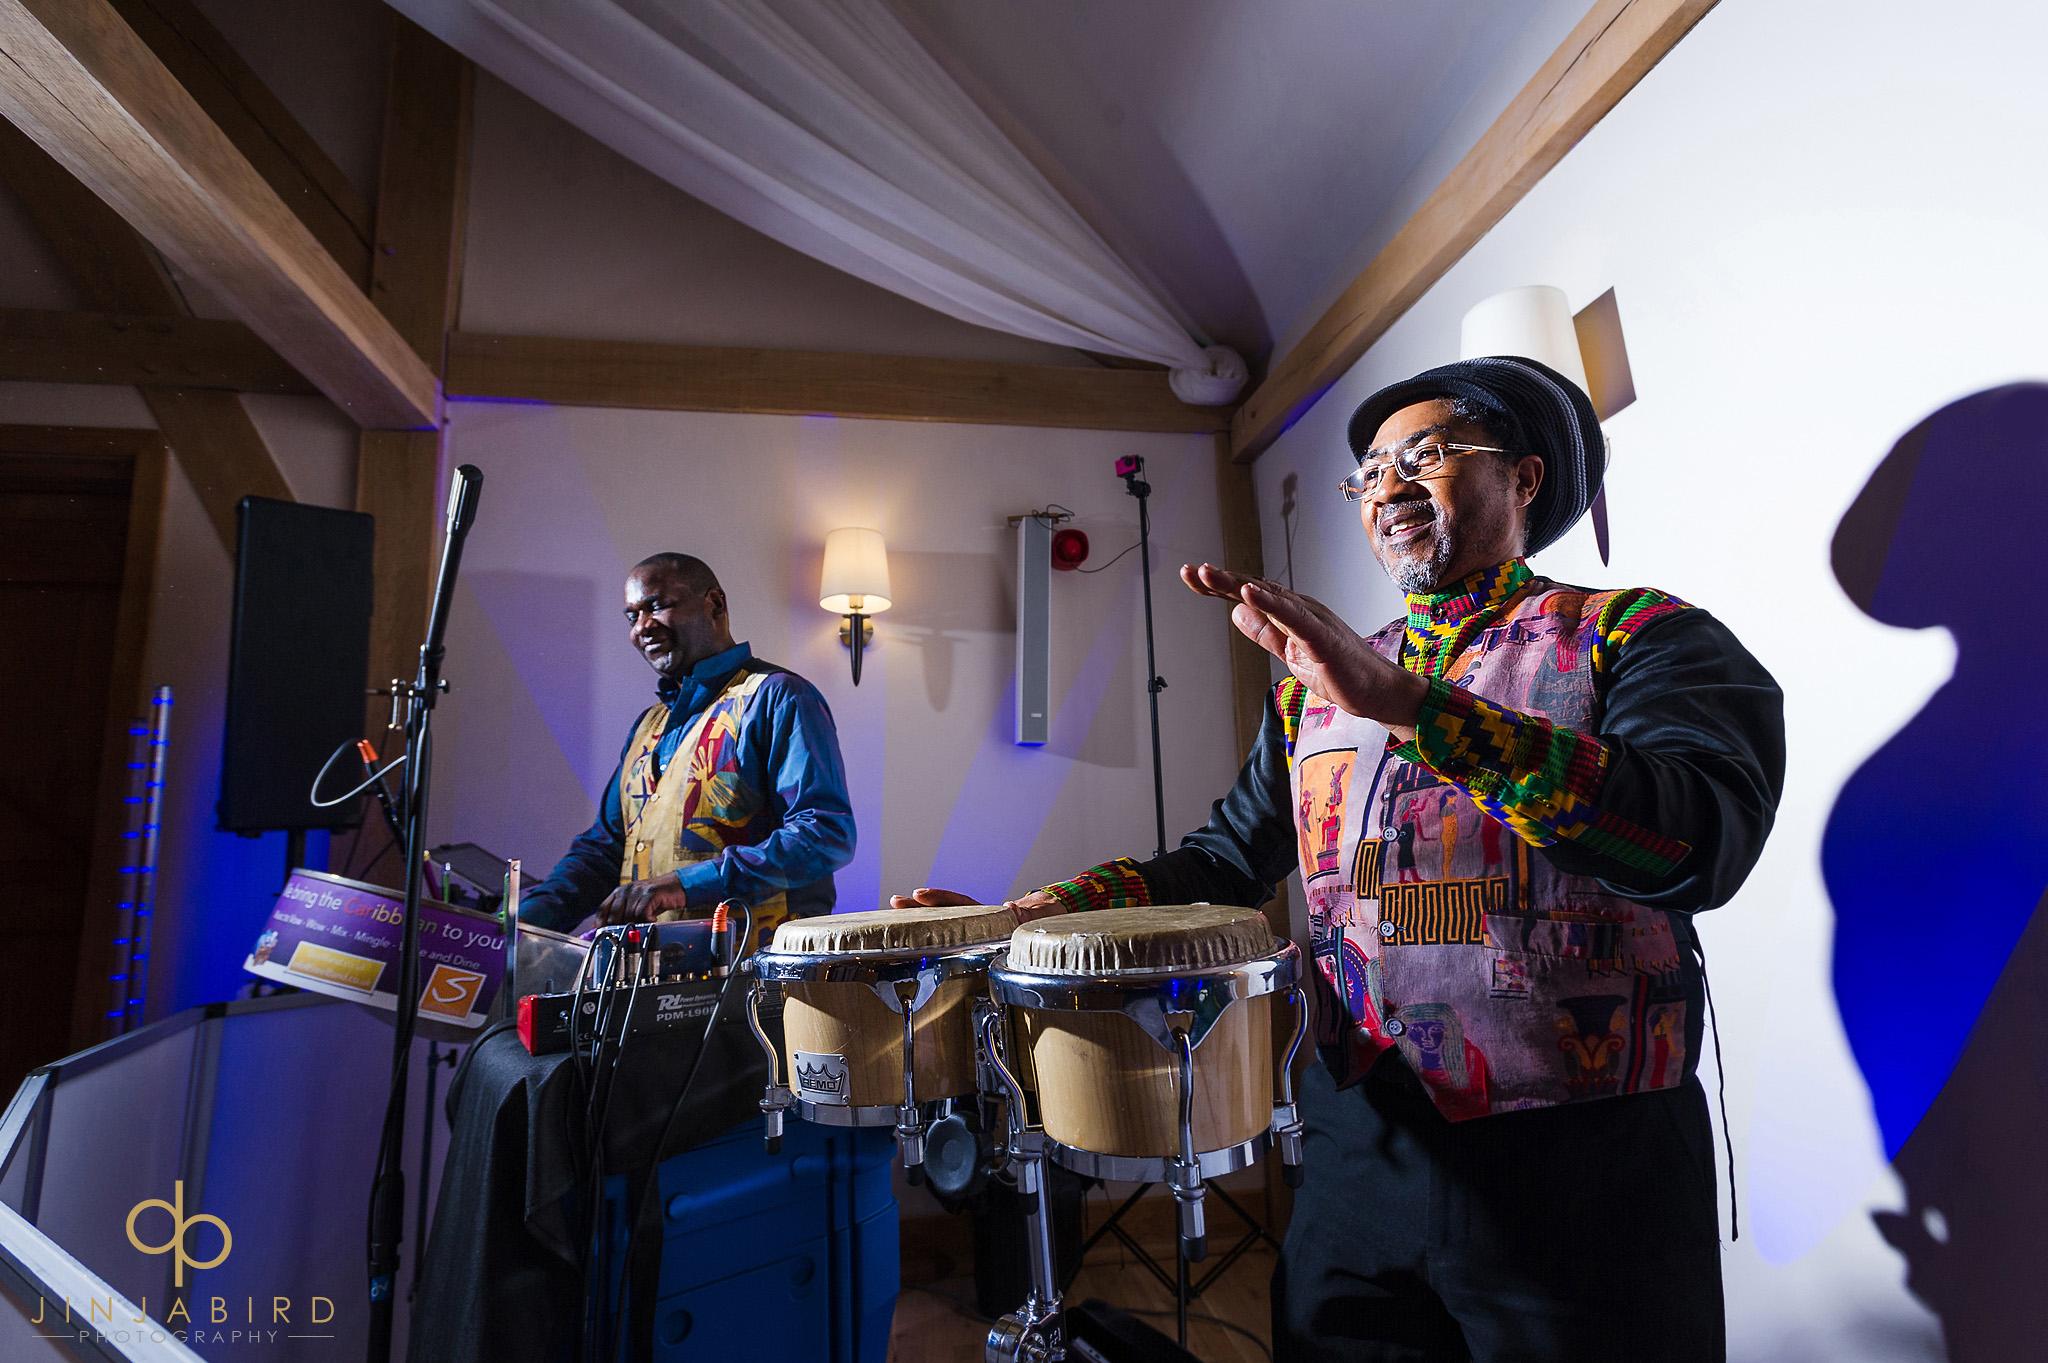 wedding band bassmead manor